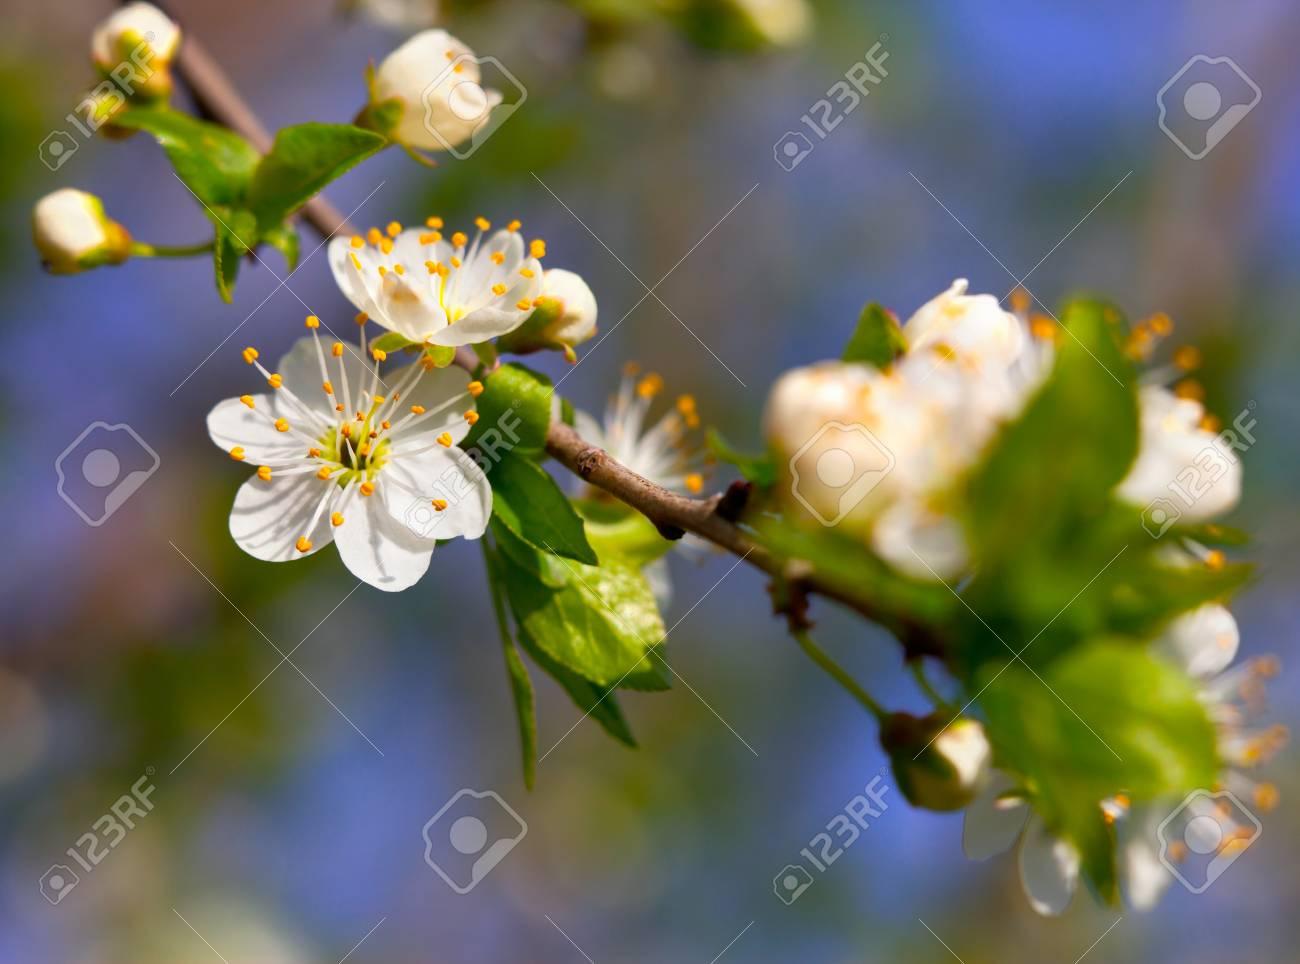 Spring season white flowers of cherry stock photo picture and spring season white flowers of cherry stock photo 26376860 mightylinksfo